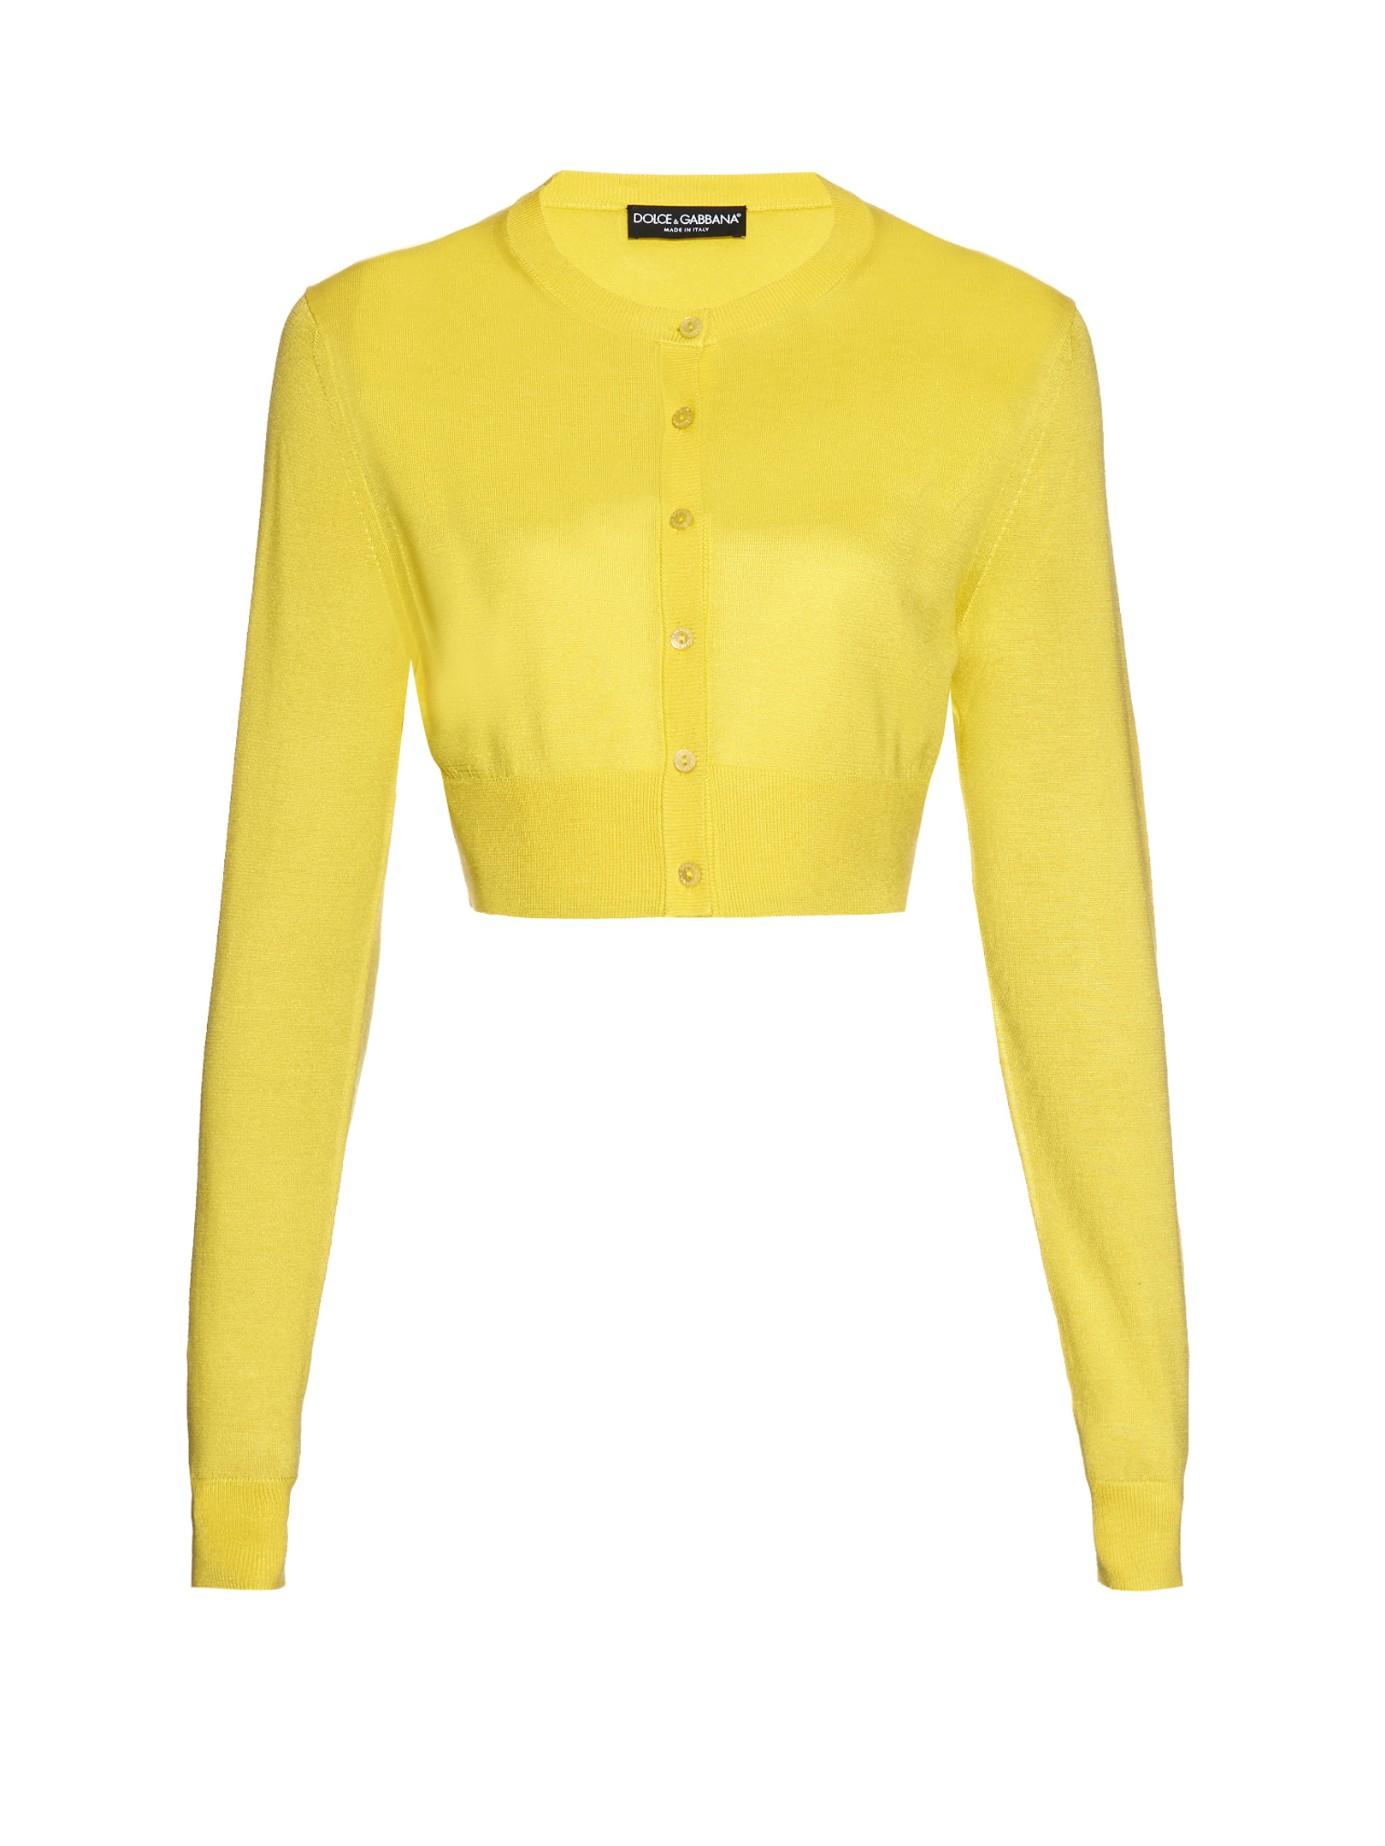 Dolce & gabbana Cropped Silk Cardigan in Yellow   Lyst